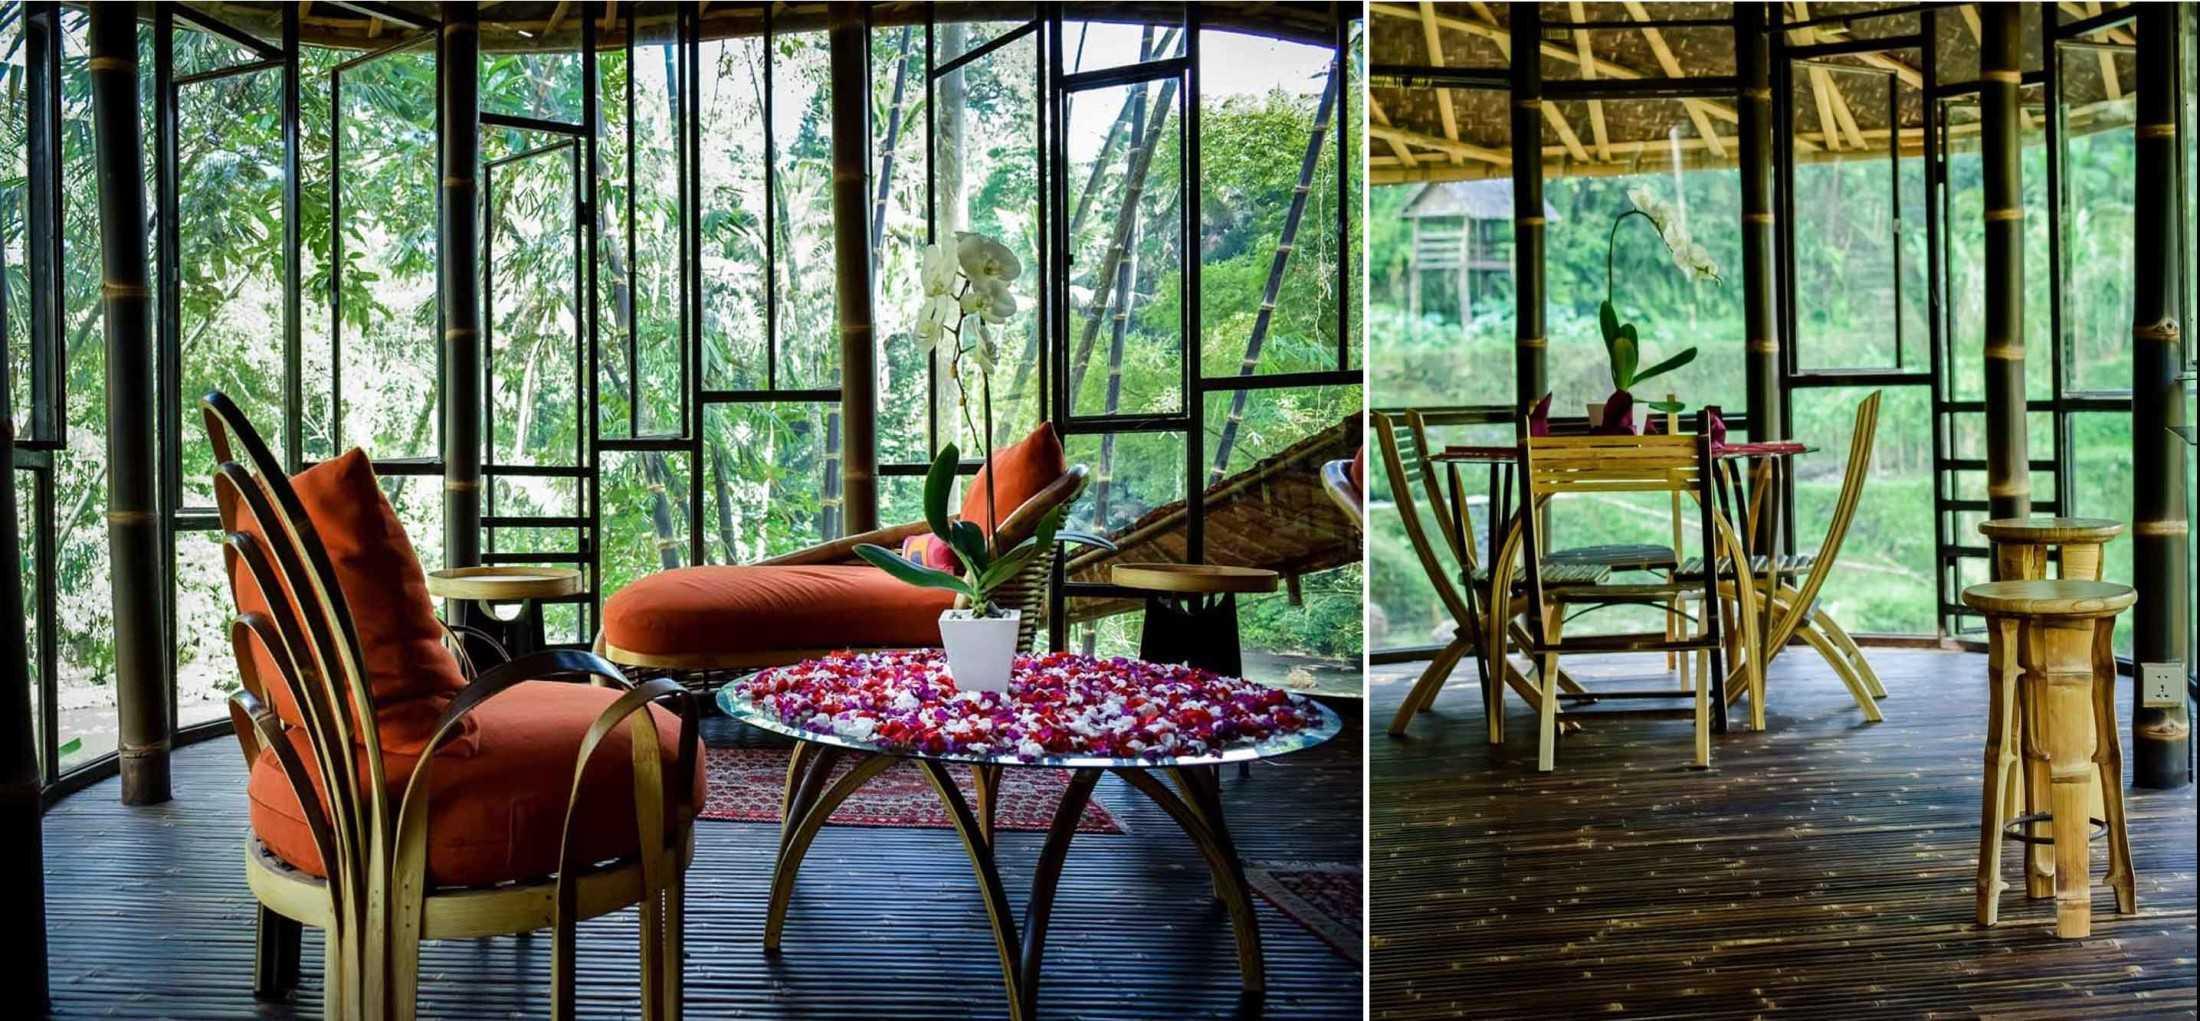 Agung Budi Raharsa | Architecture & Engineering Riverbend Bamboo House - Bali Bali, Indonesia Bali, Indonesia Agung-Budi-Raharsa-Riverbend-House-Bali  88717